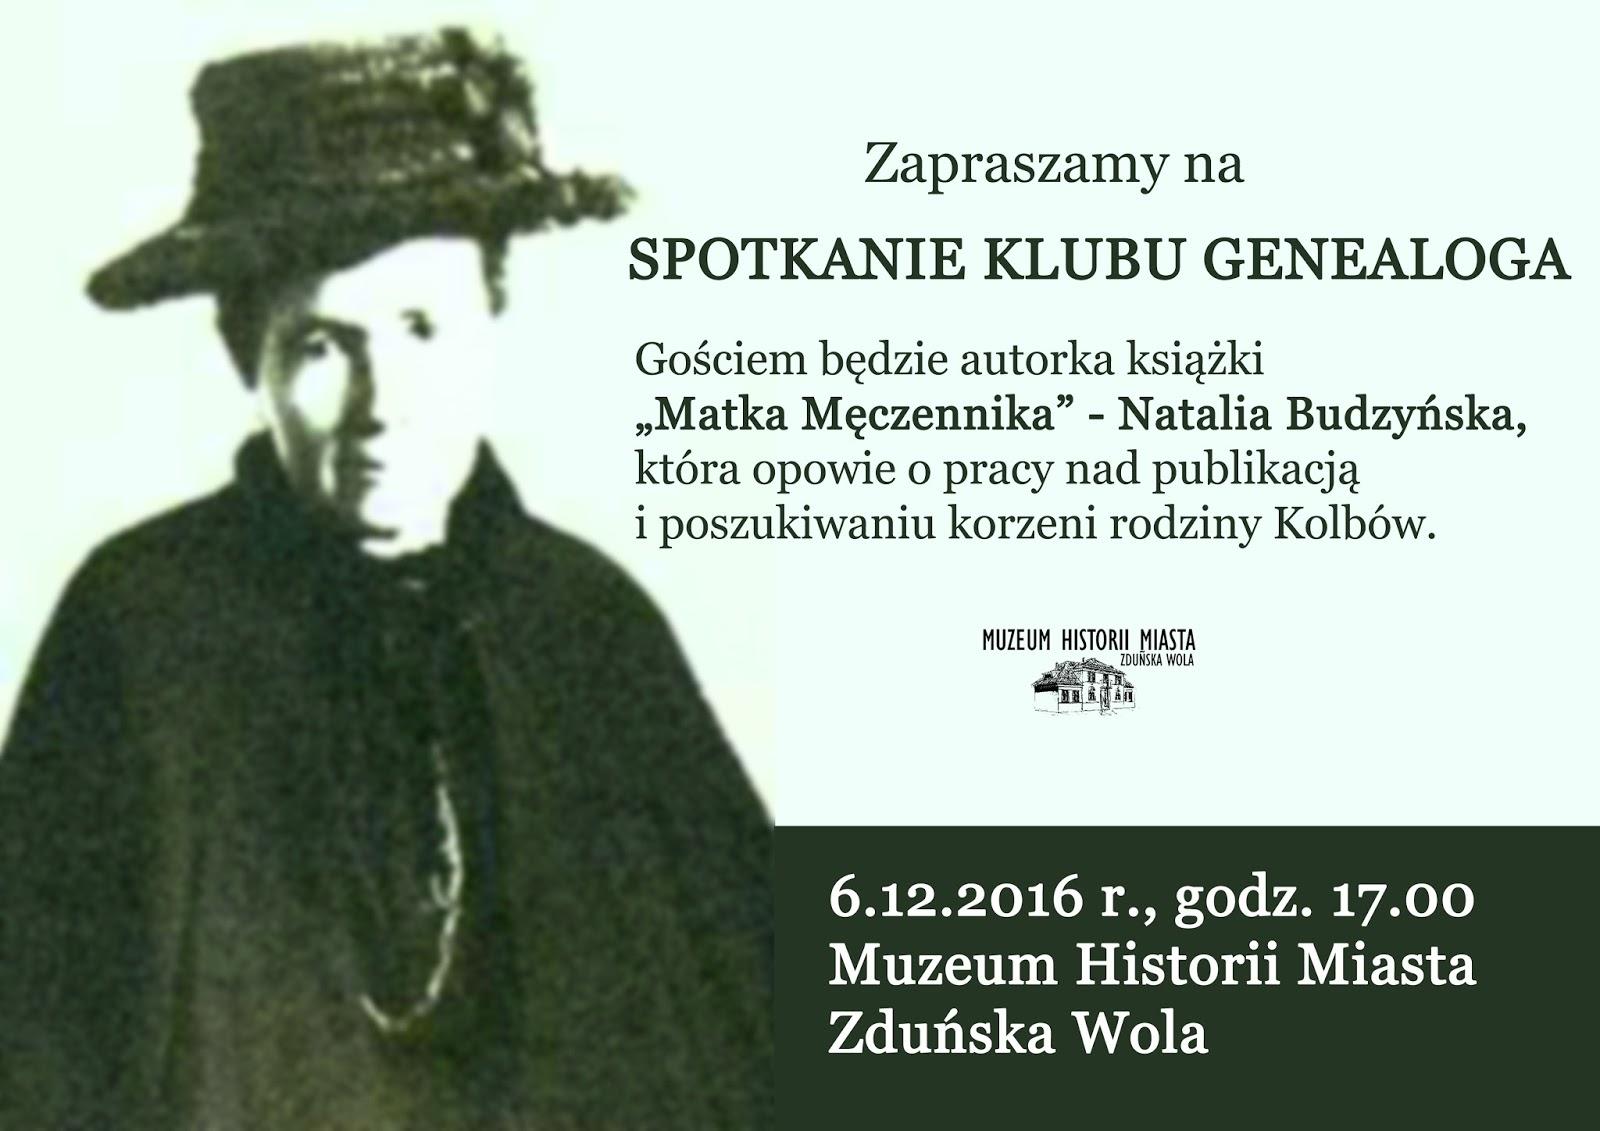 Untitled - Zduska Wola